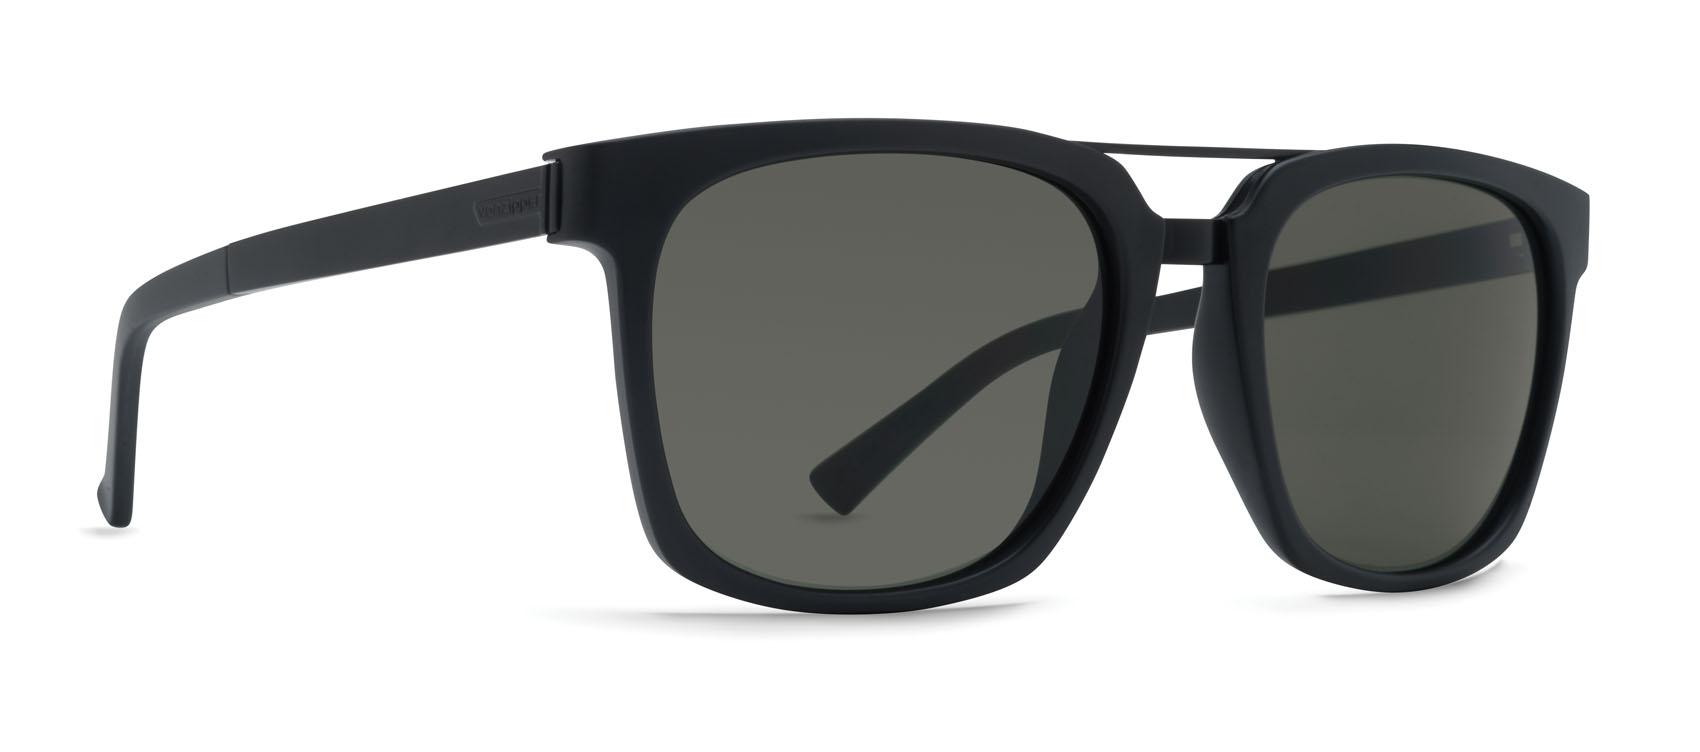 f569adfb30 VonZipper Plimton Sunglasses Black Satin Vintage Grey